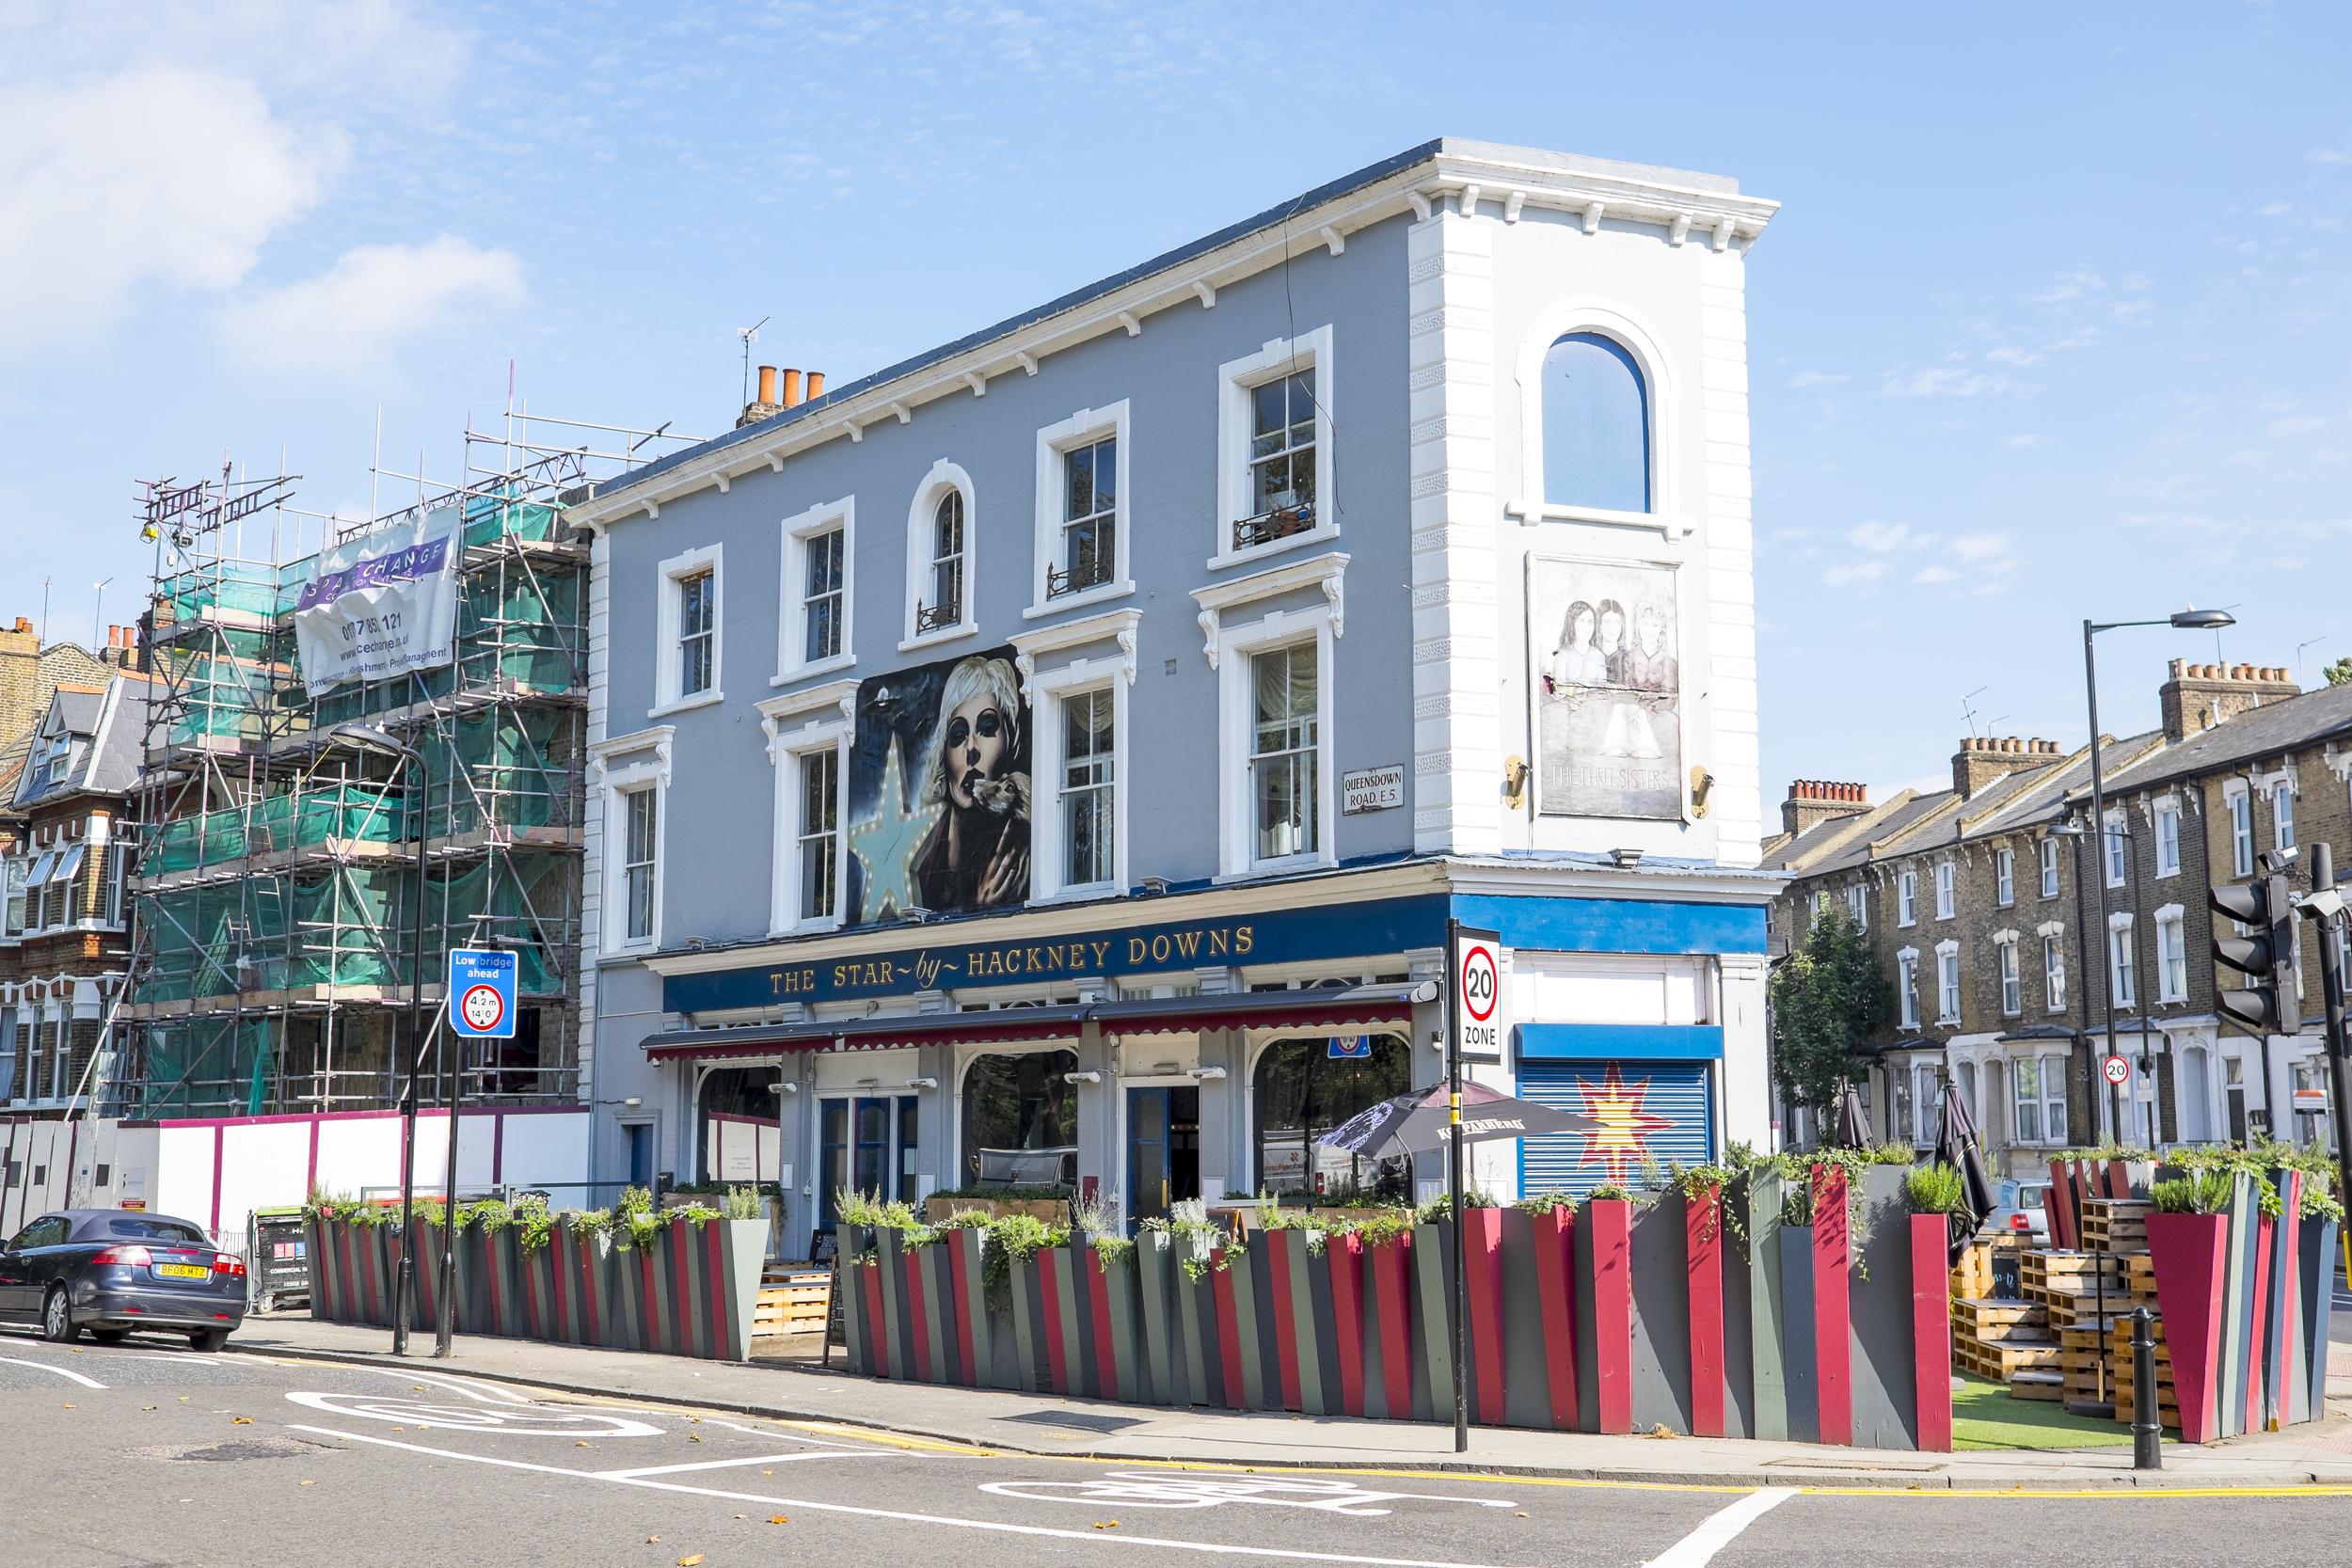 Hackney, London, The Street Where I Live blog